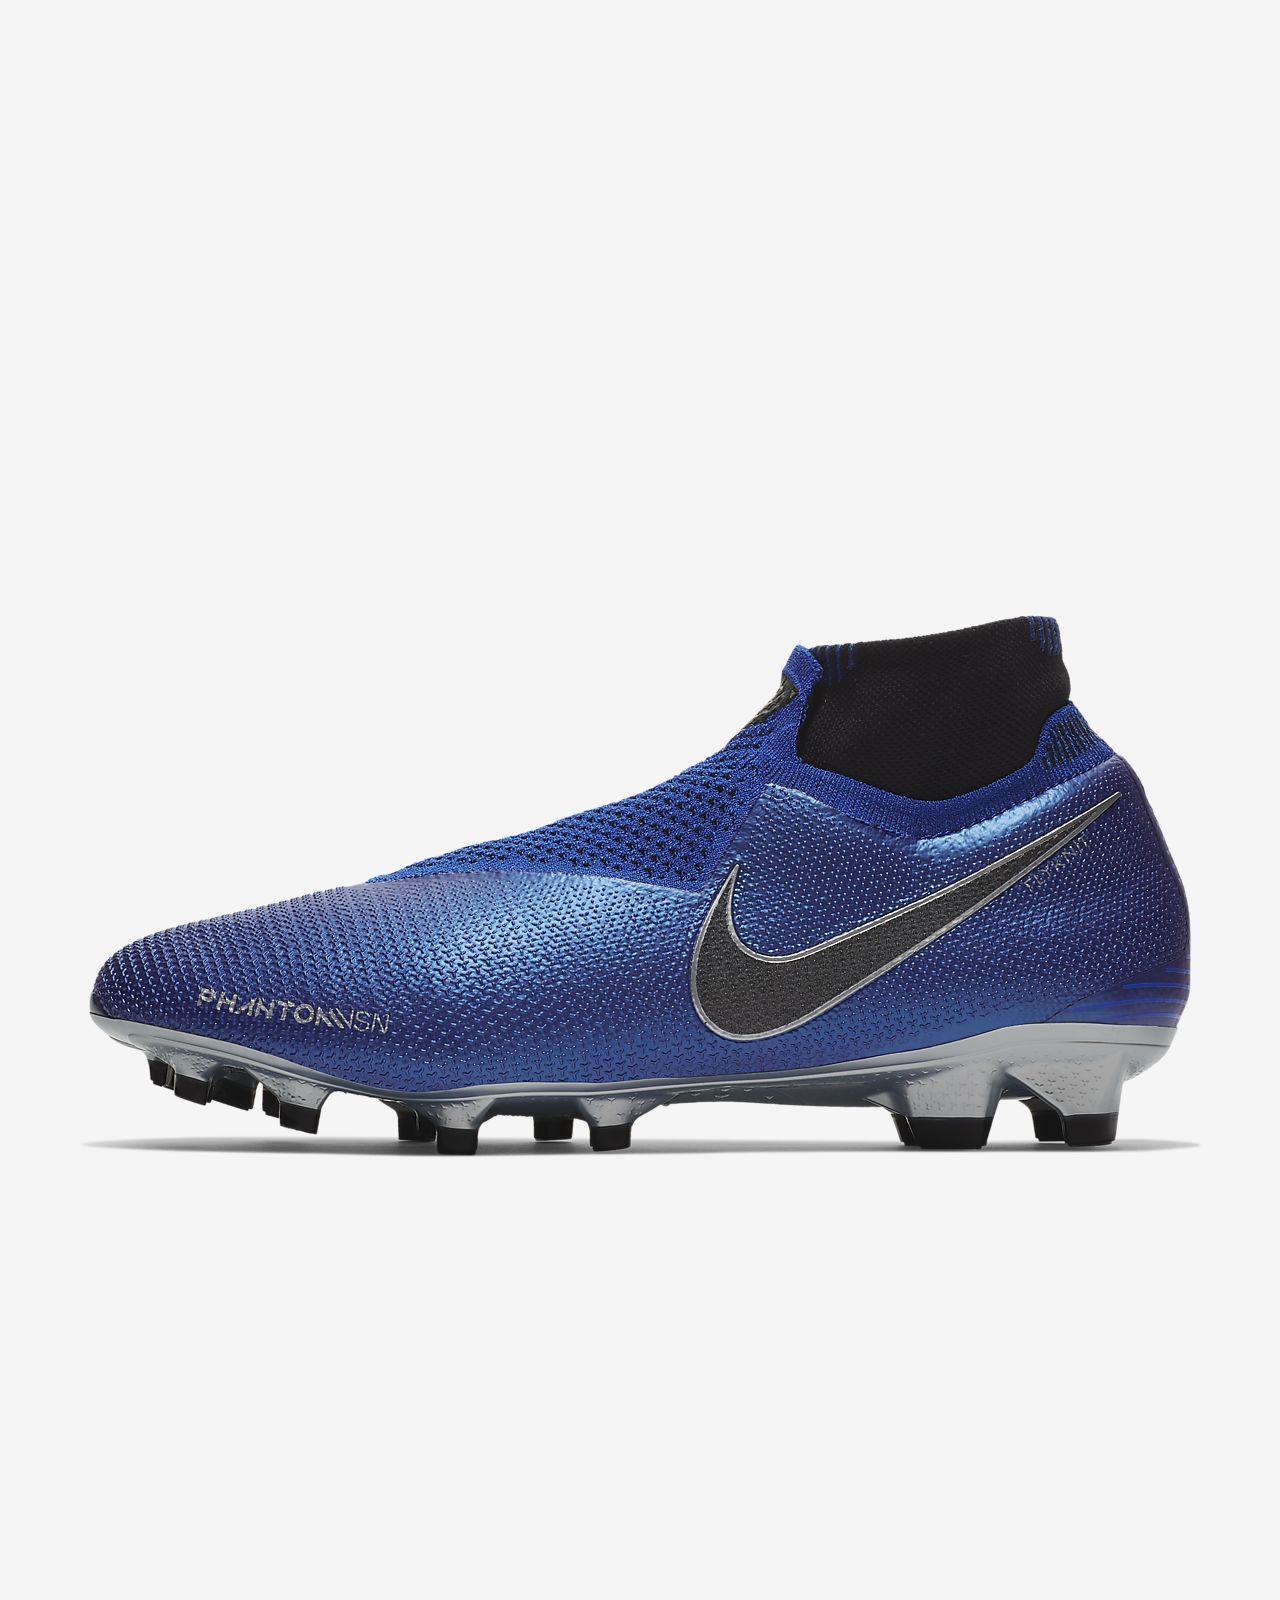 991d5eaaff333 ... Nike Phantom Vision Elite Dynamic Fit FG Botas de fútbol para terreno  firme